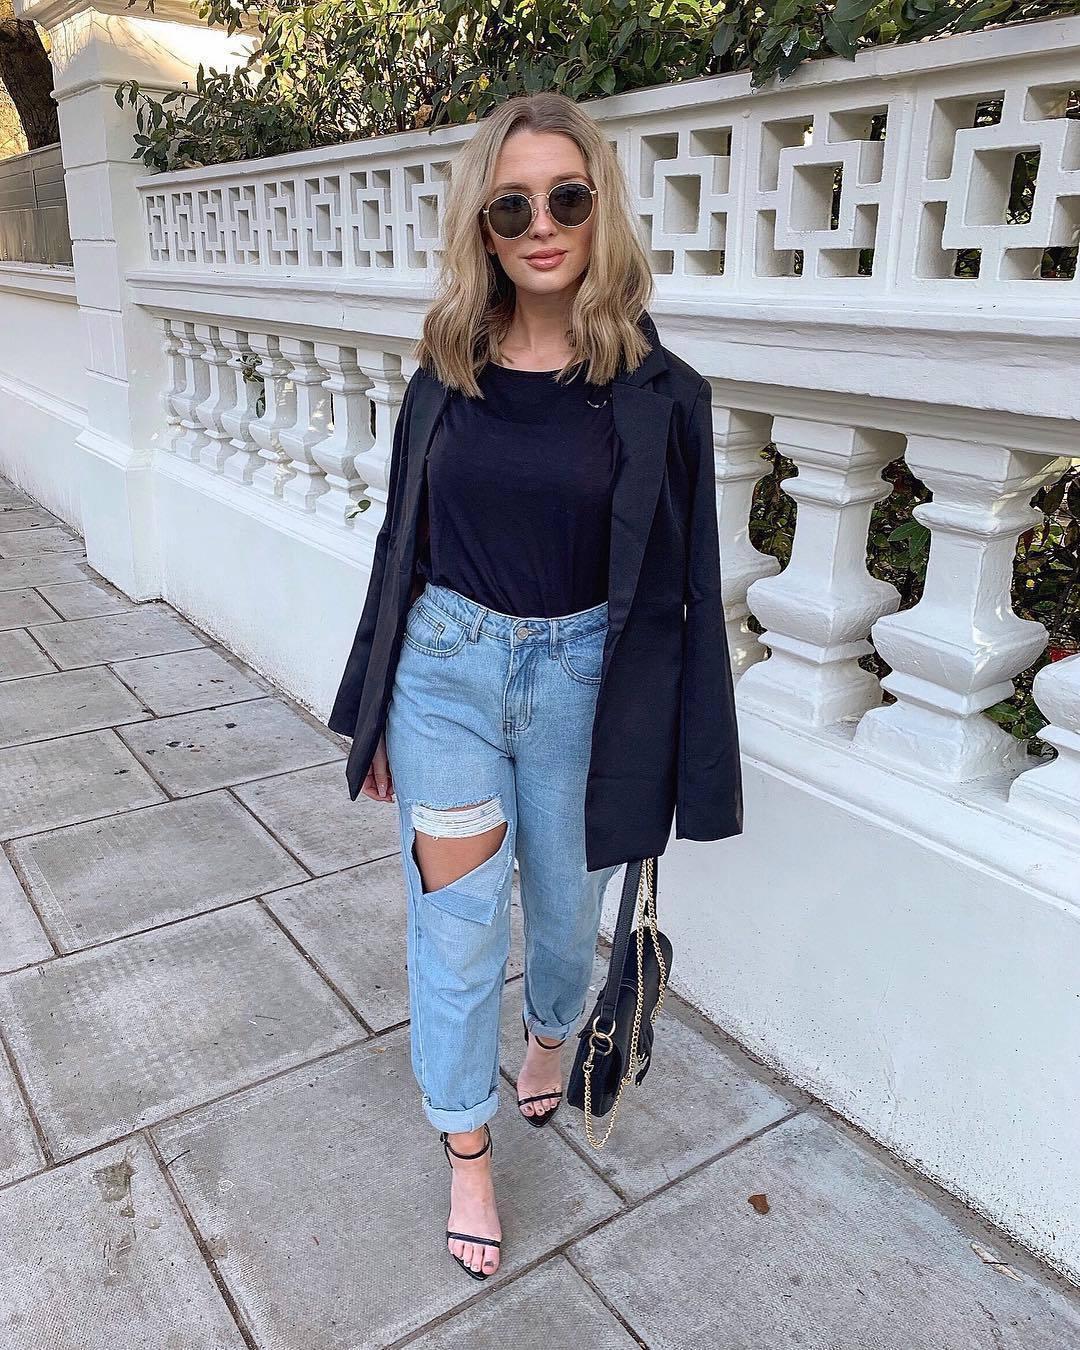 a7fae18d013 jeans mom jeans high waisted jeans ripped jeans black sandals black bag black  top black blazer